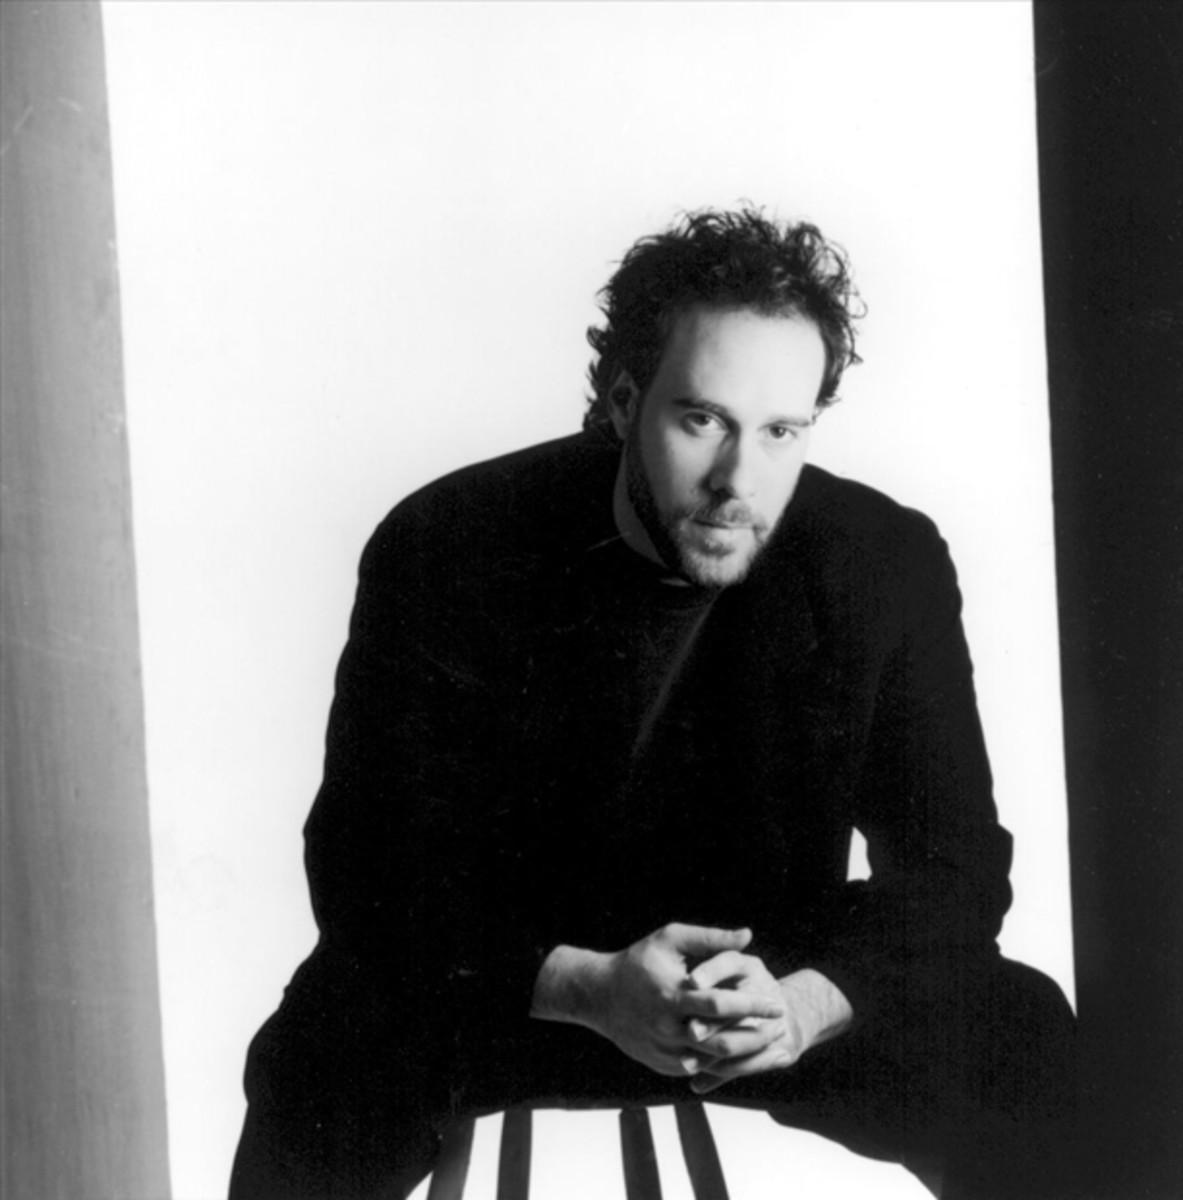 Marc Cohn early promo photo